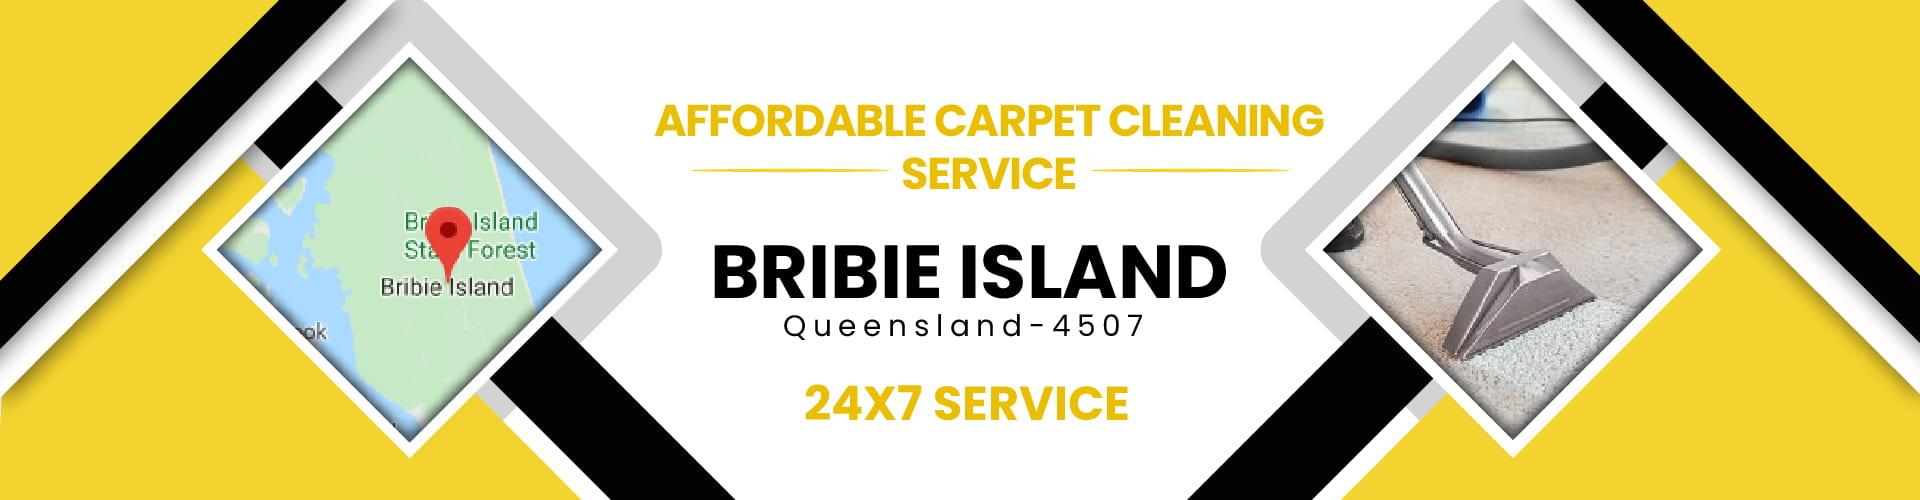 Carpet Cleaning Bribie Island